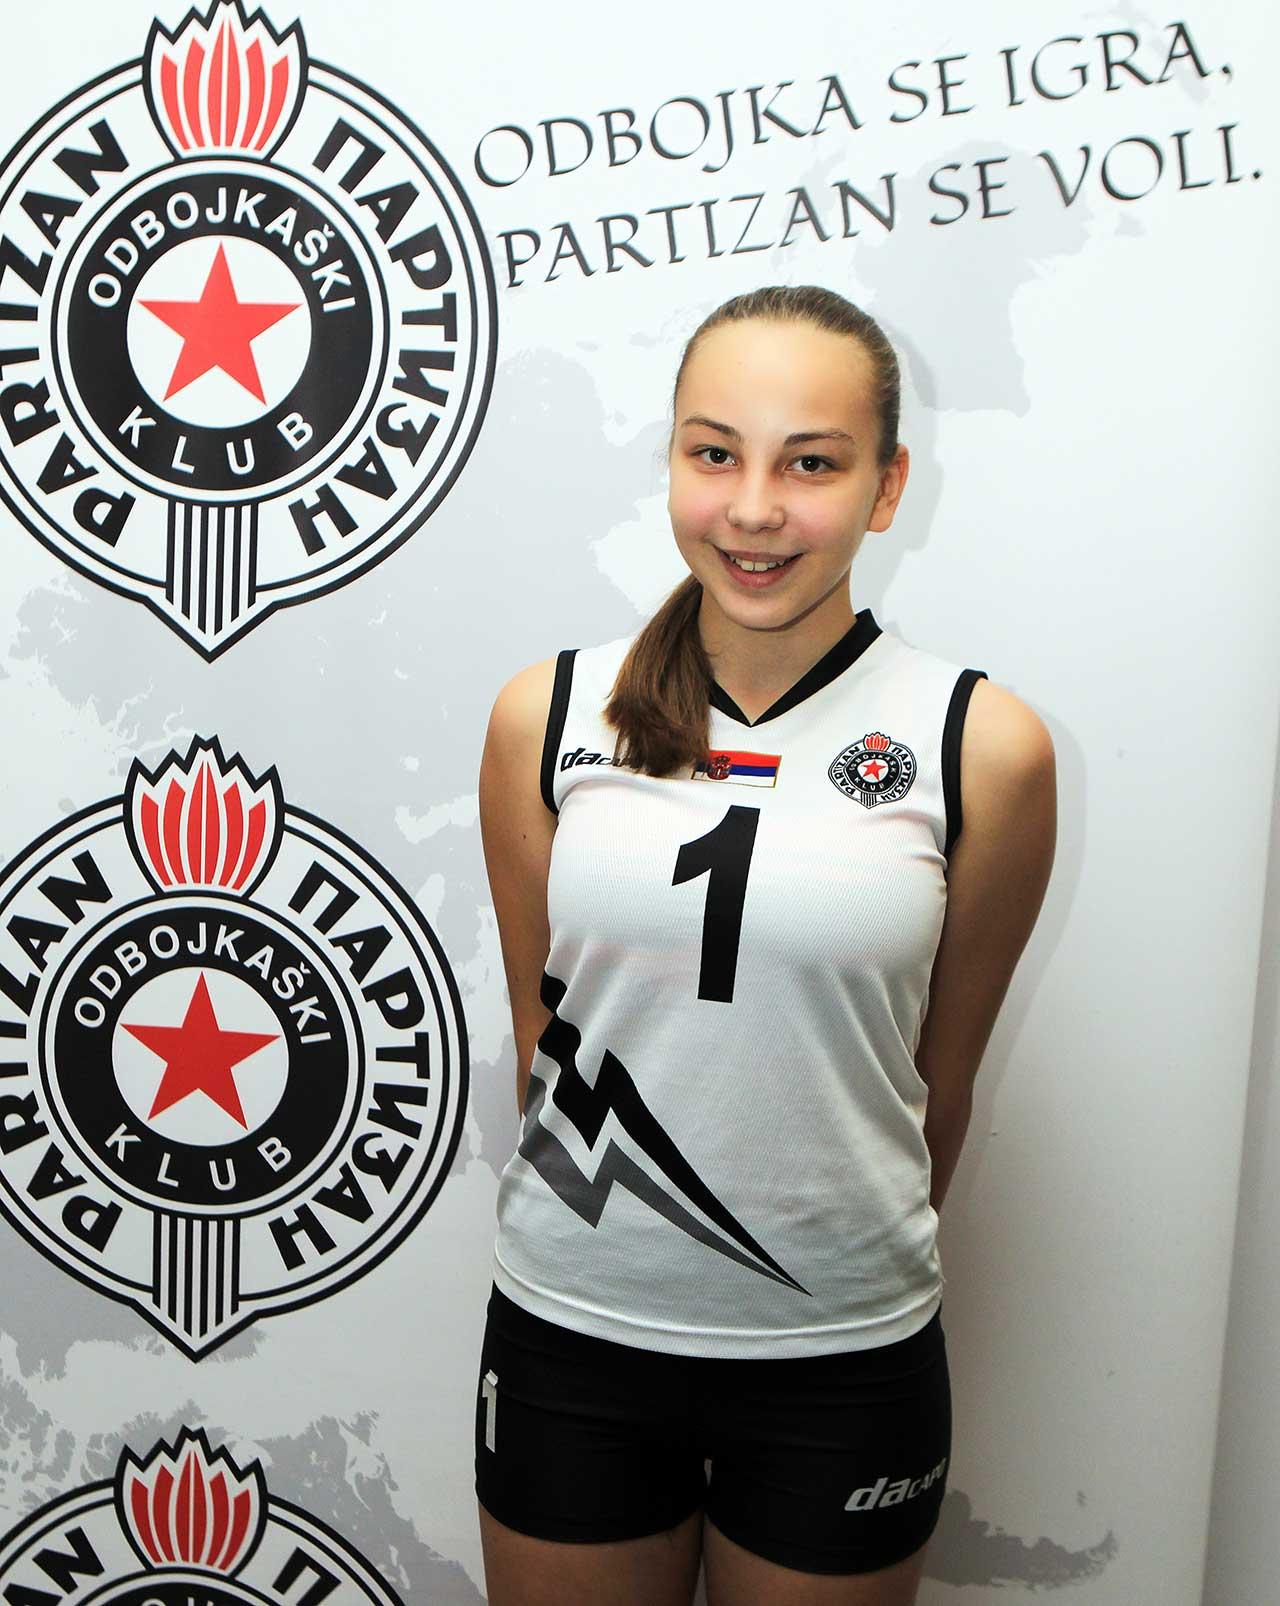 Tanasković Emilija